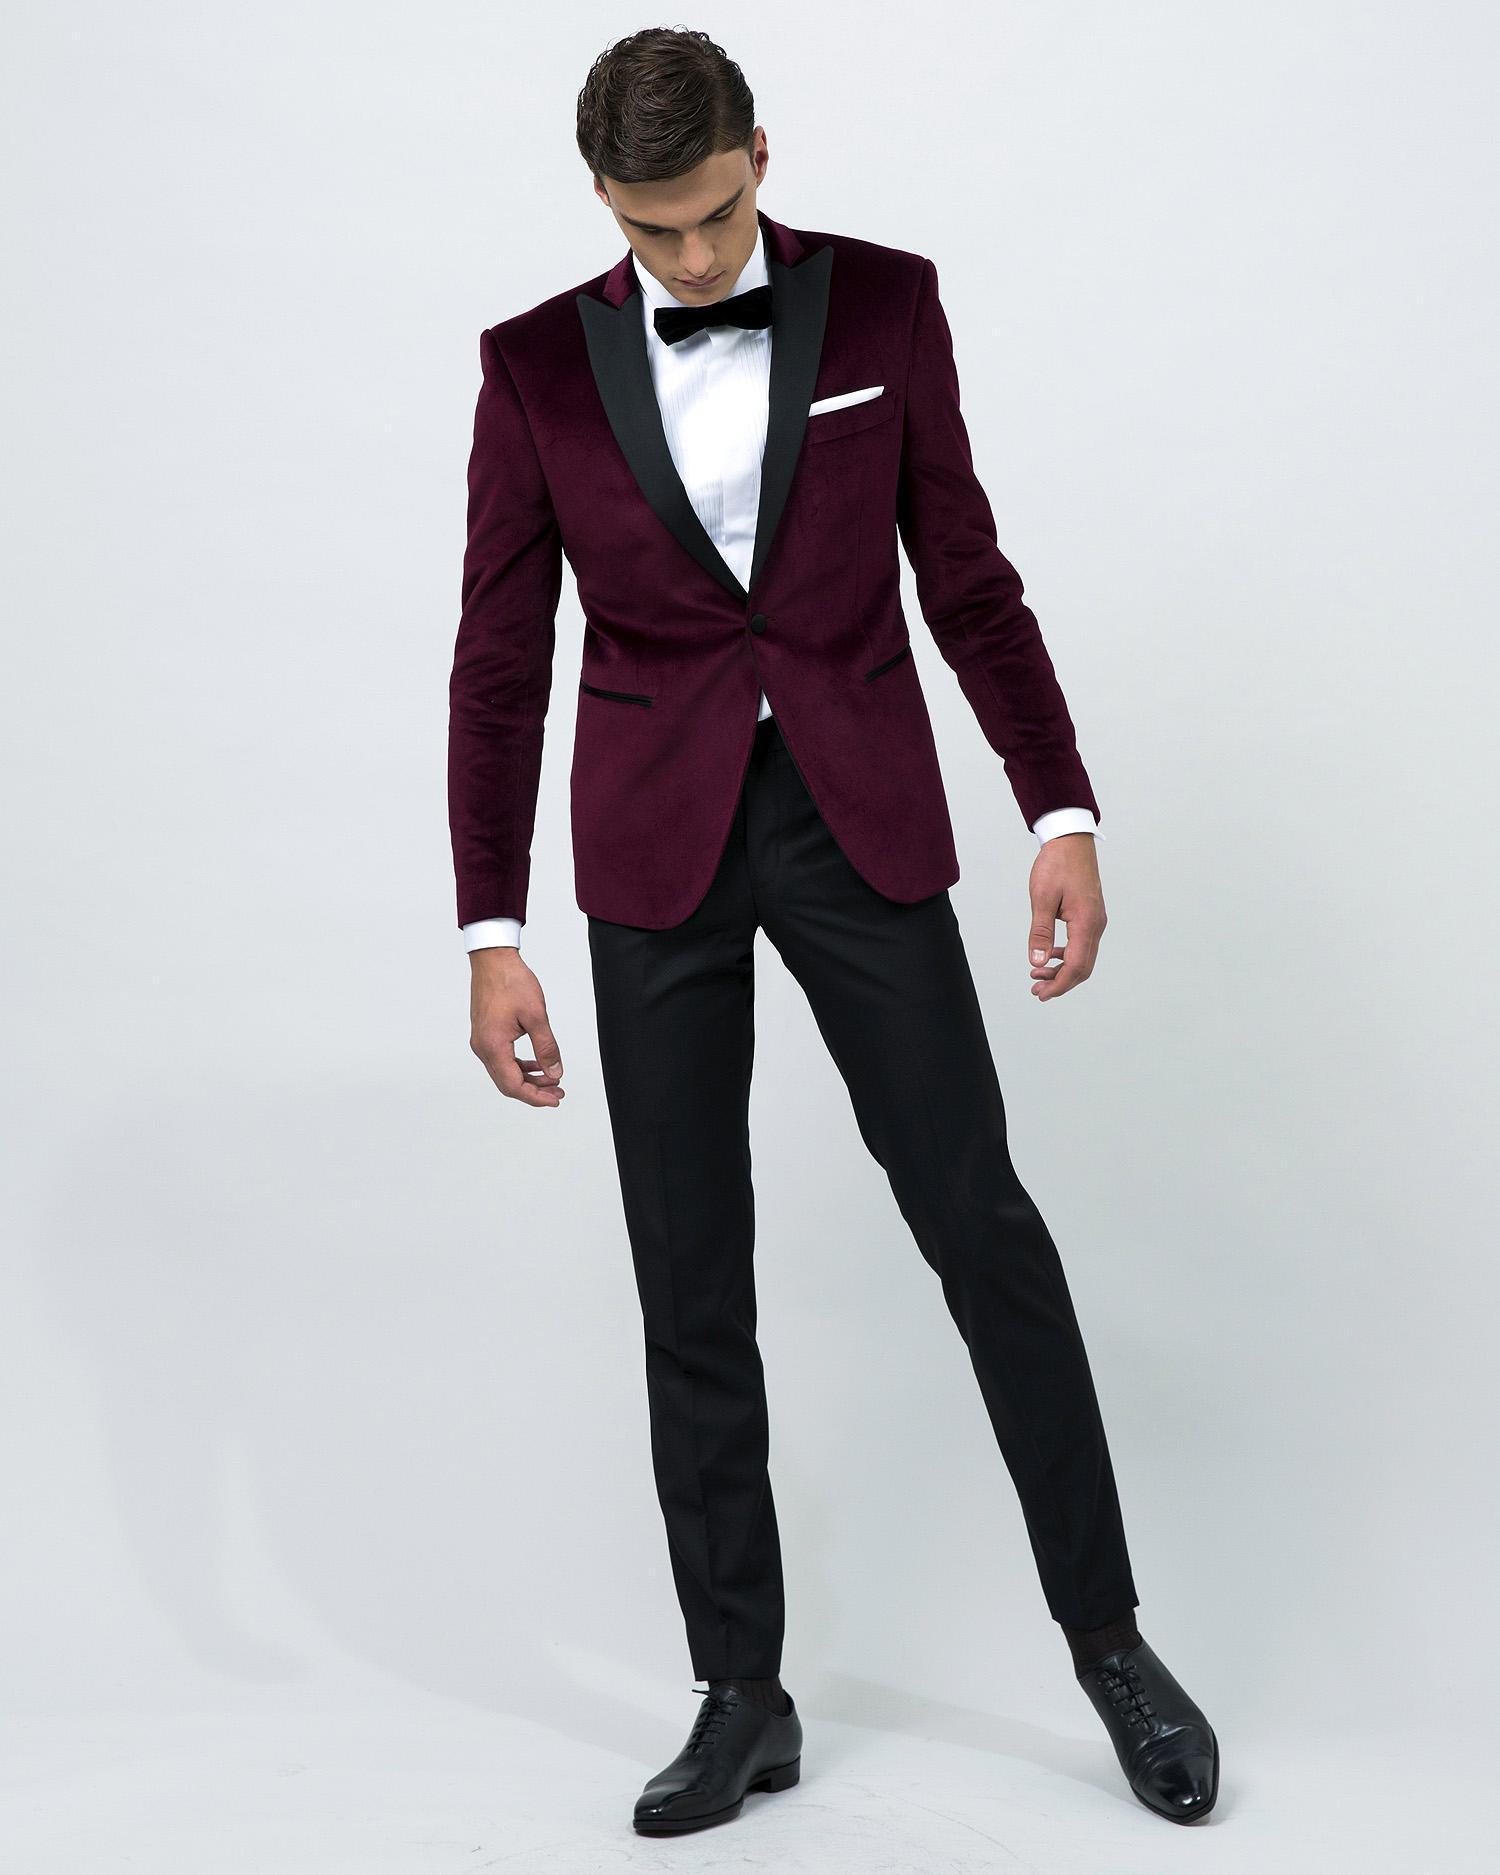 2016 Borgogna Velvet Groom Tuxedos Peak bavero groommens adatta / Abiti da sposa su misura per uomo (jakcet + pantaloni + cravatta + tasche)